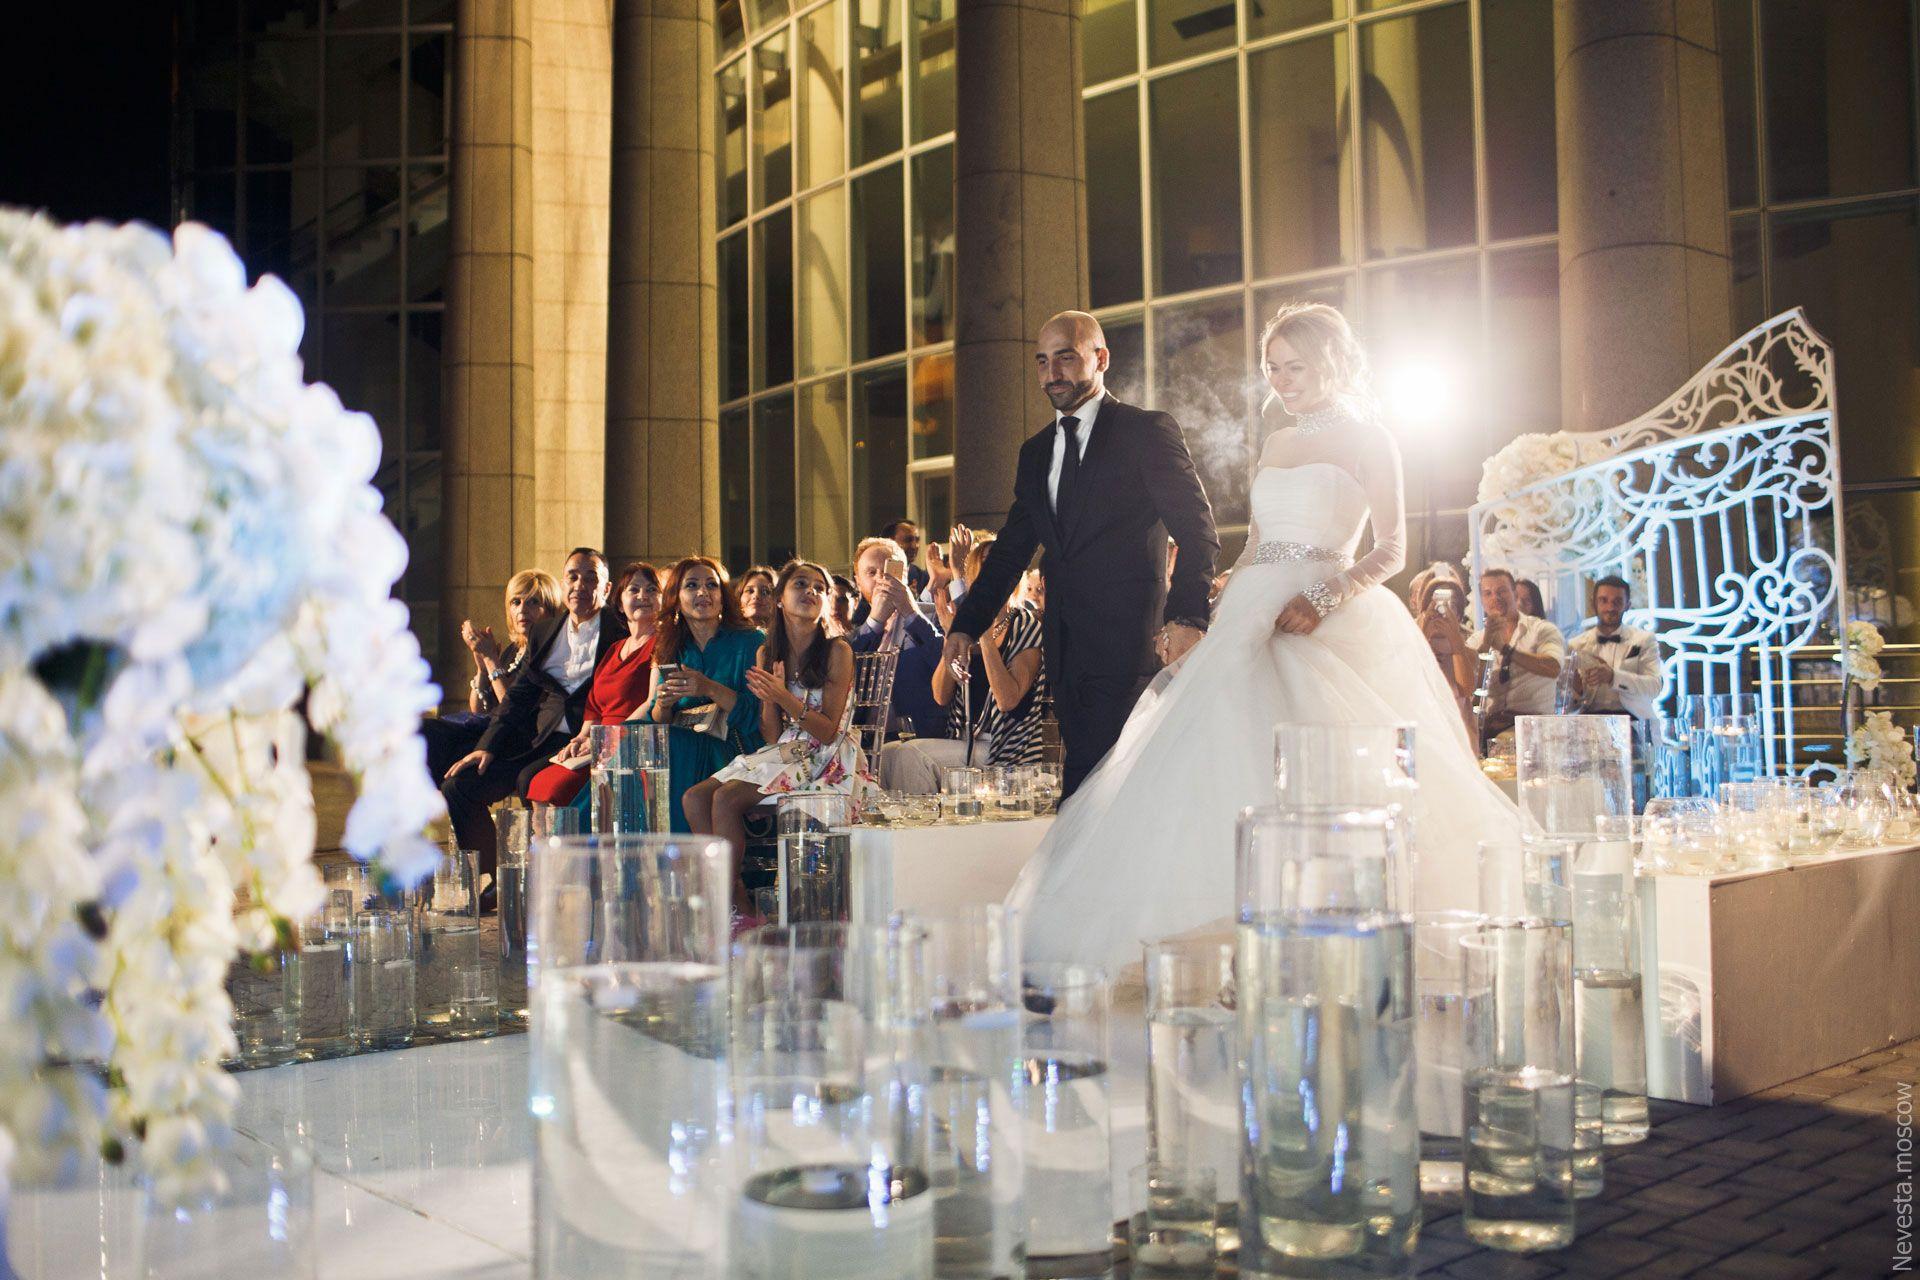 Свадьба Анны Хилькевич и Артура Волкова, фото 13